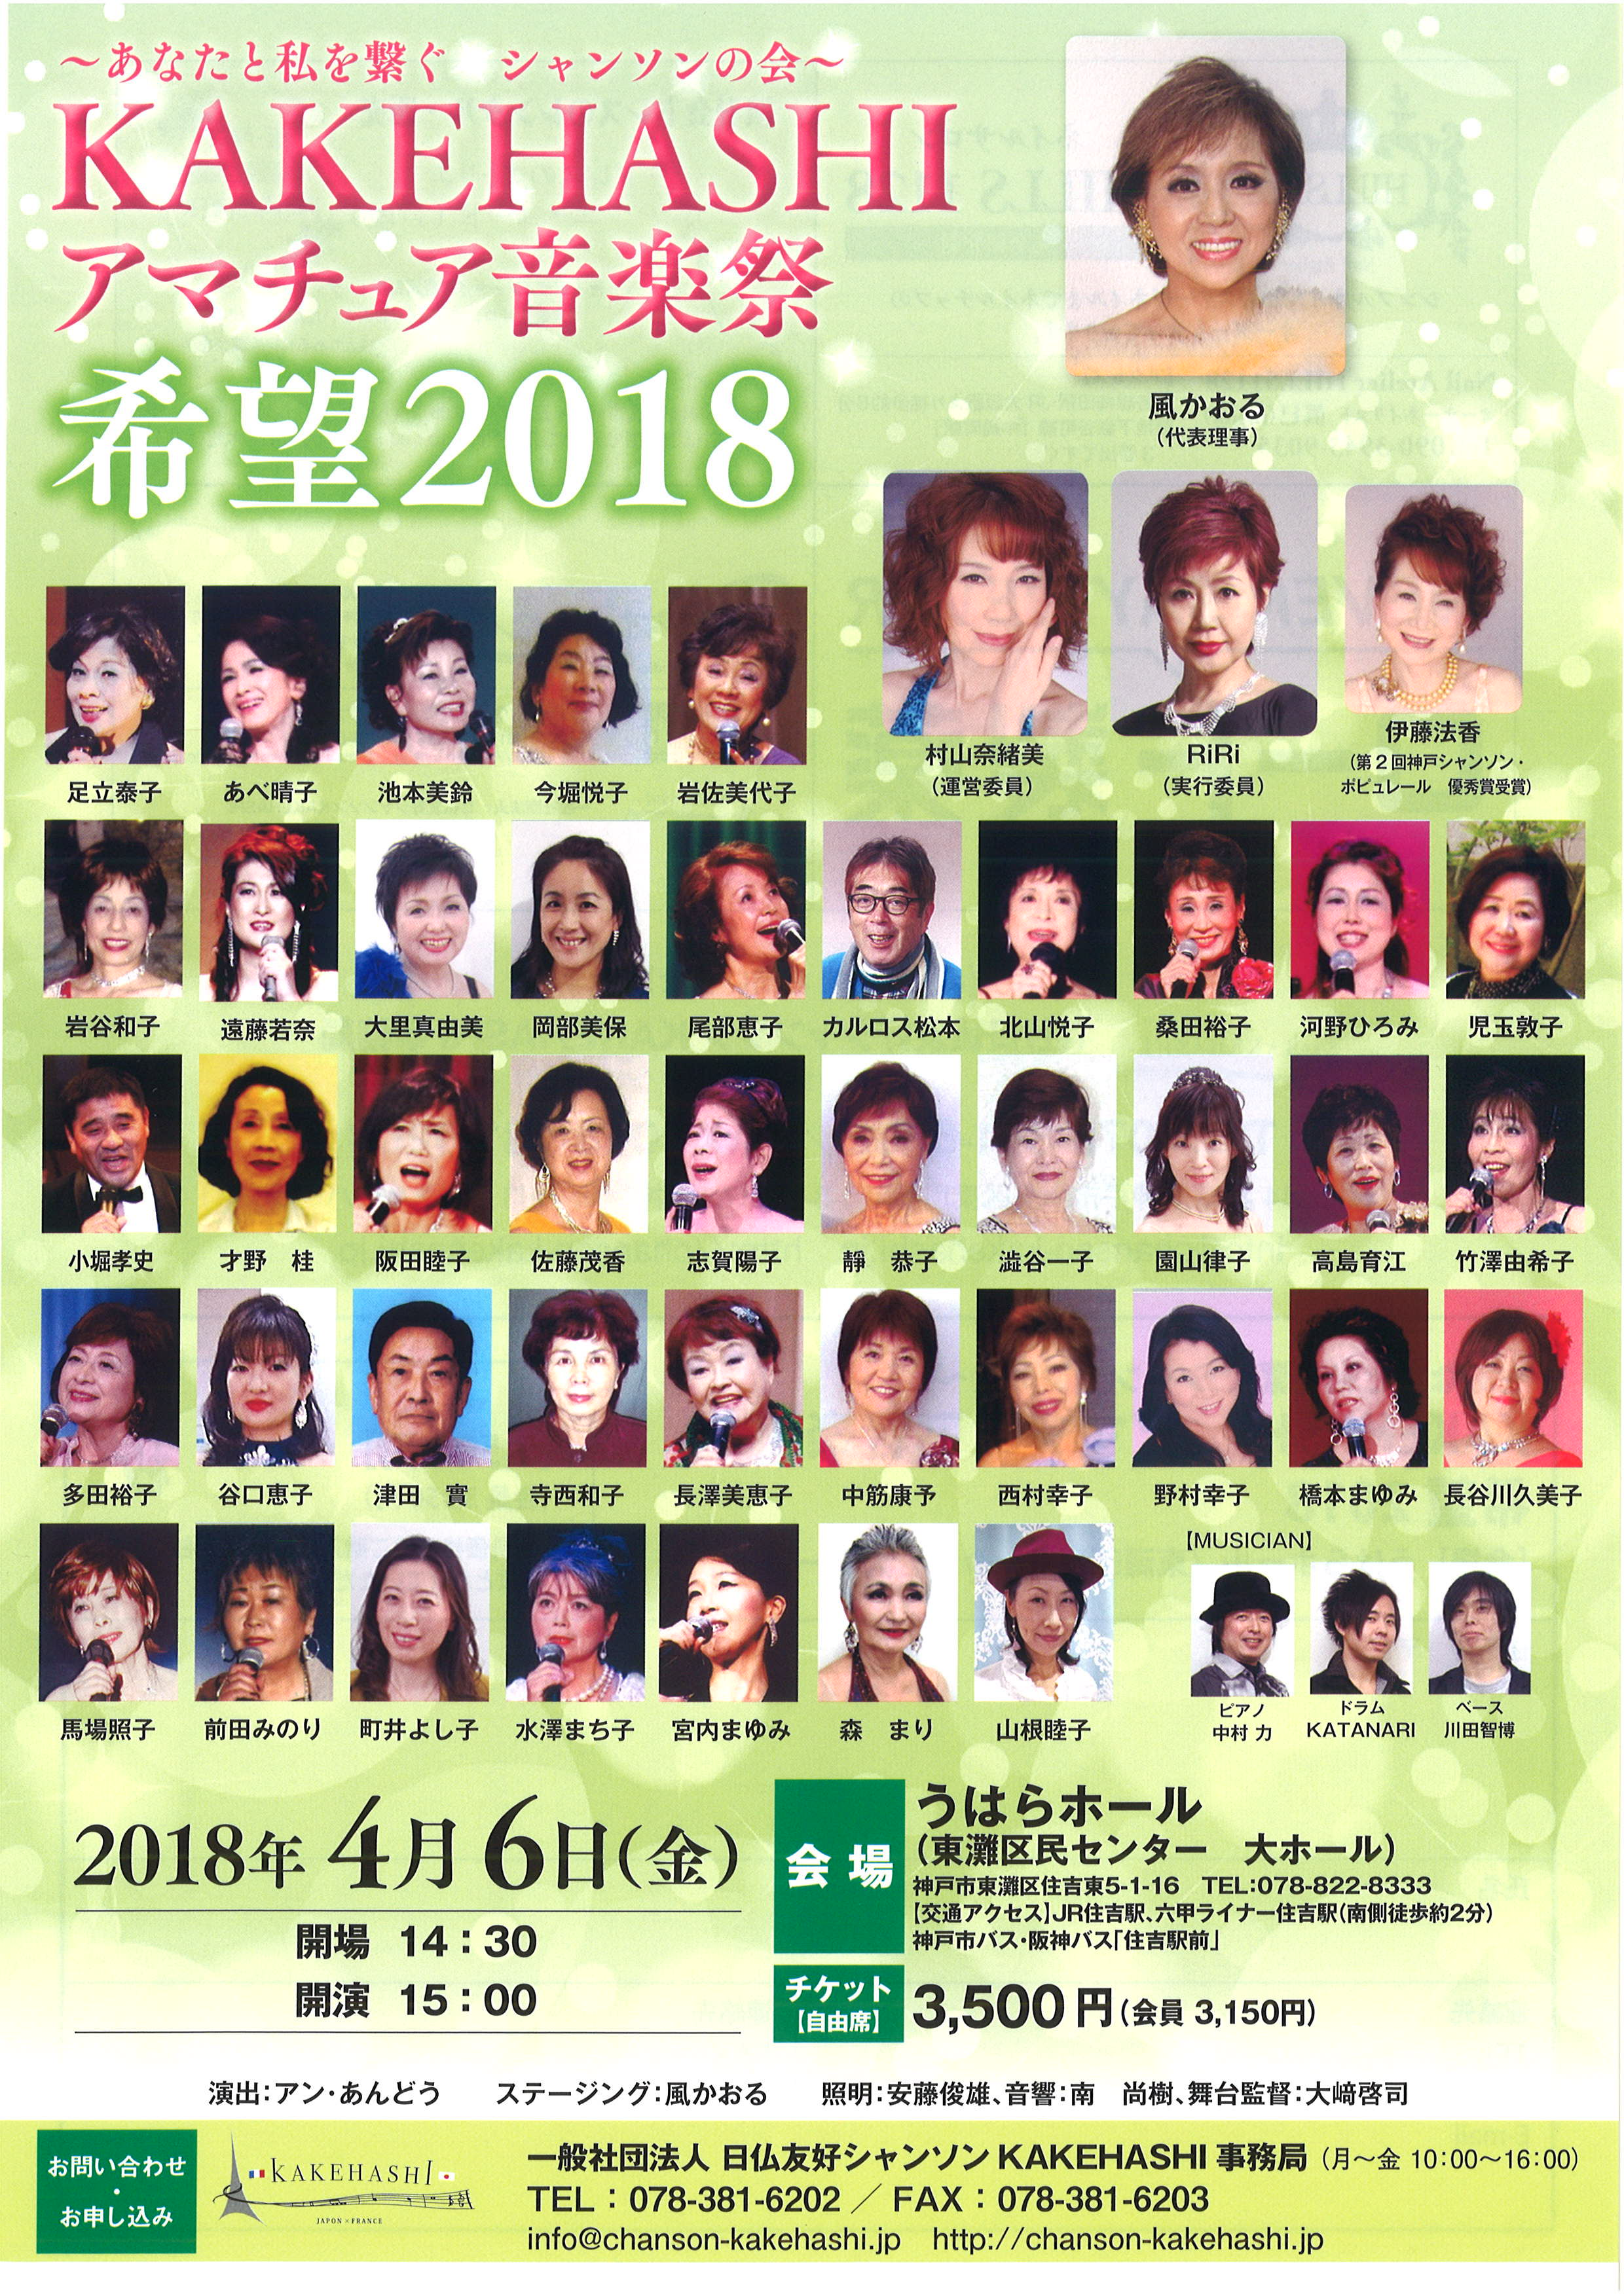 KAKEHASHIアマチュア音楽祭-希望2018.jpg